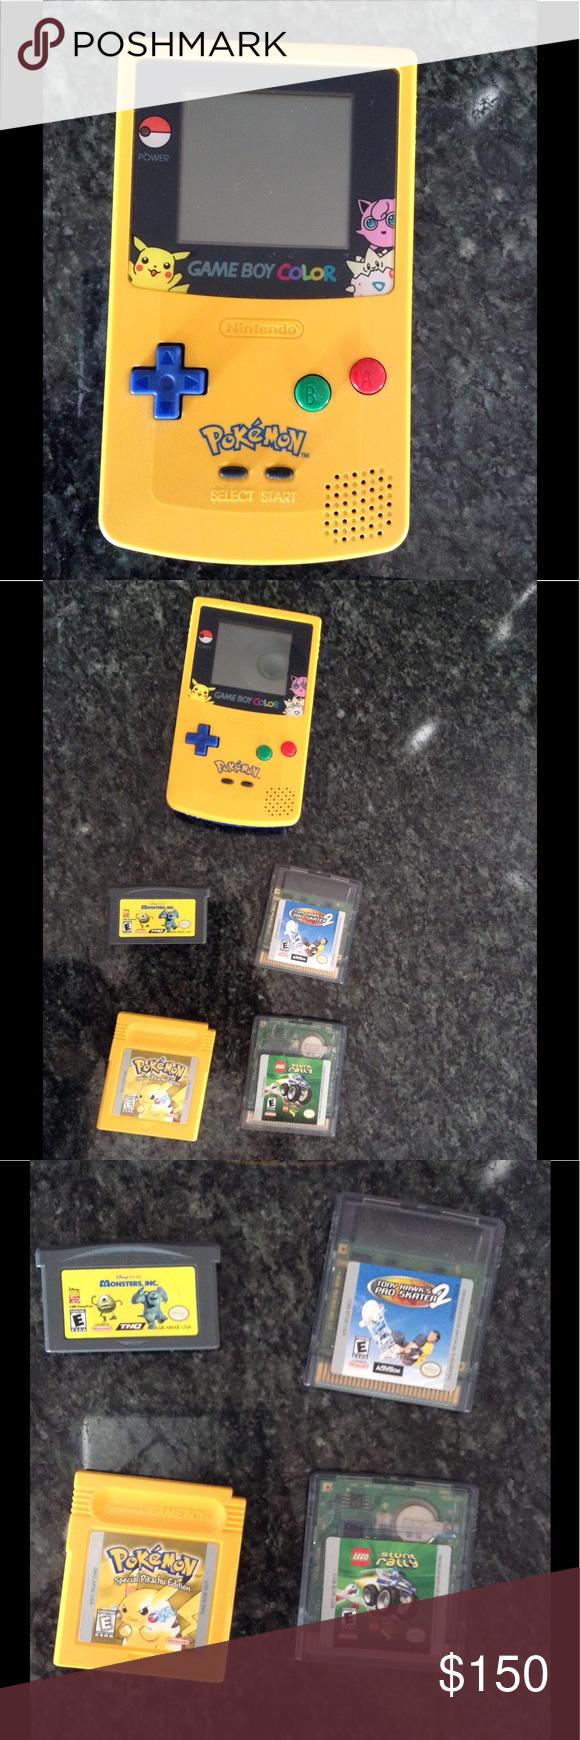 Game Boy Color Special Pokemon Edition Gameboy Pokemon Tony Hawk Pro Skater